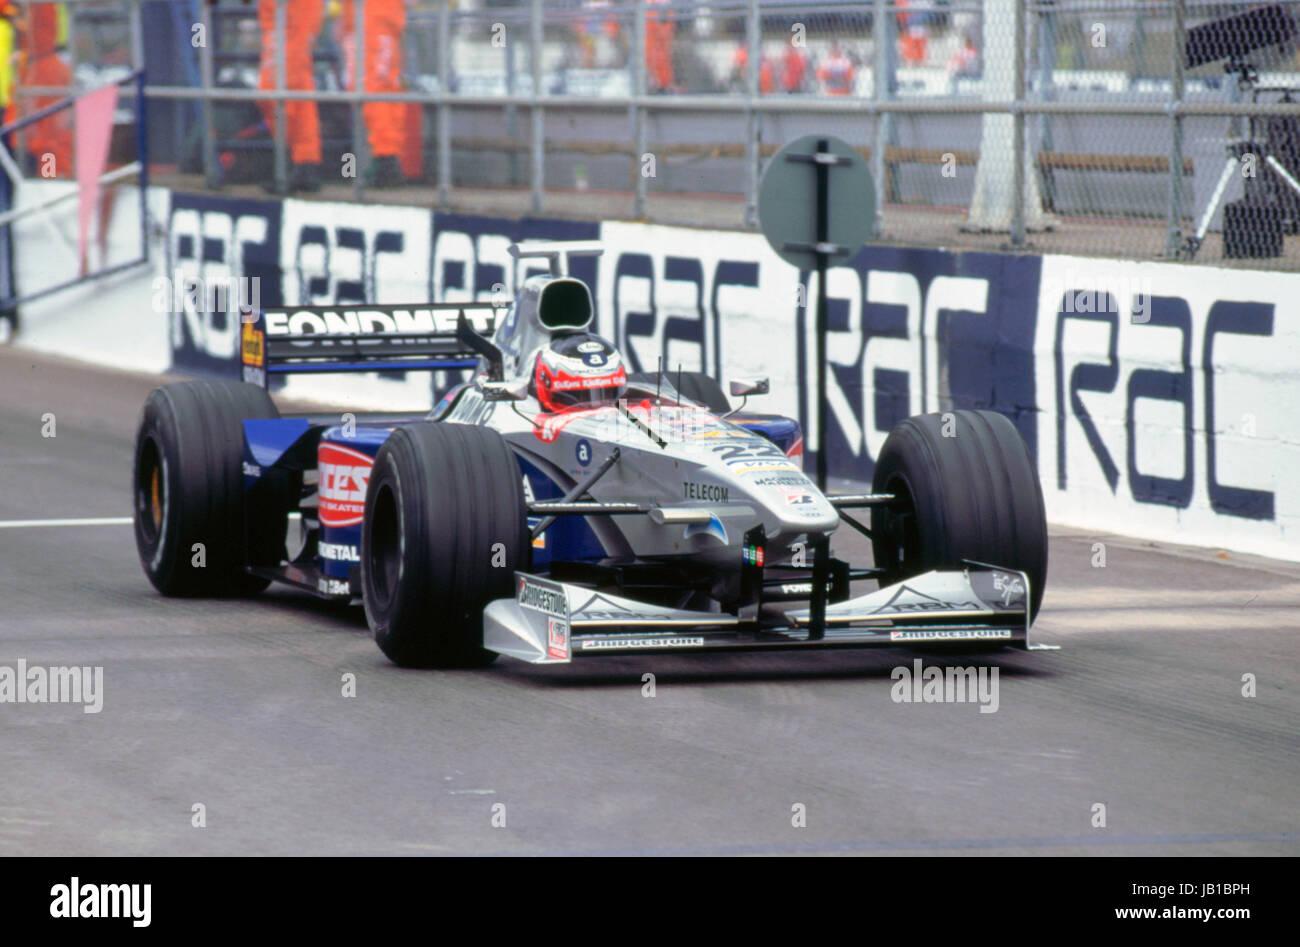 Minardi M198, S. Nakamo 1998 British Grand Prix - Stock Image